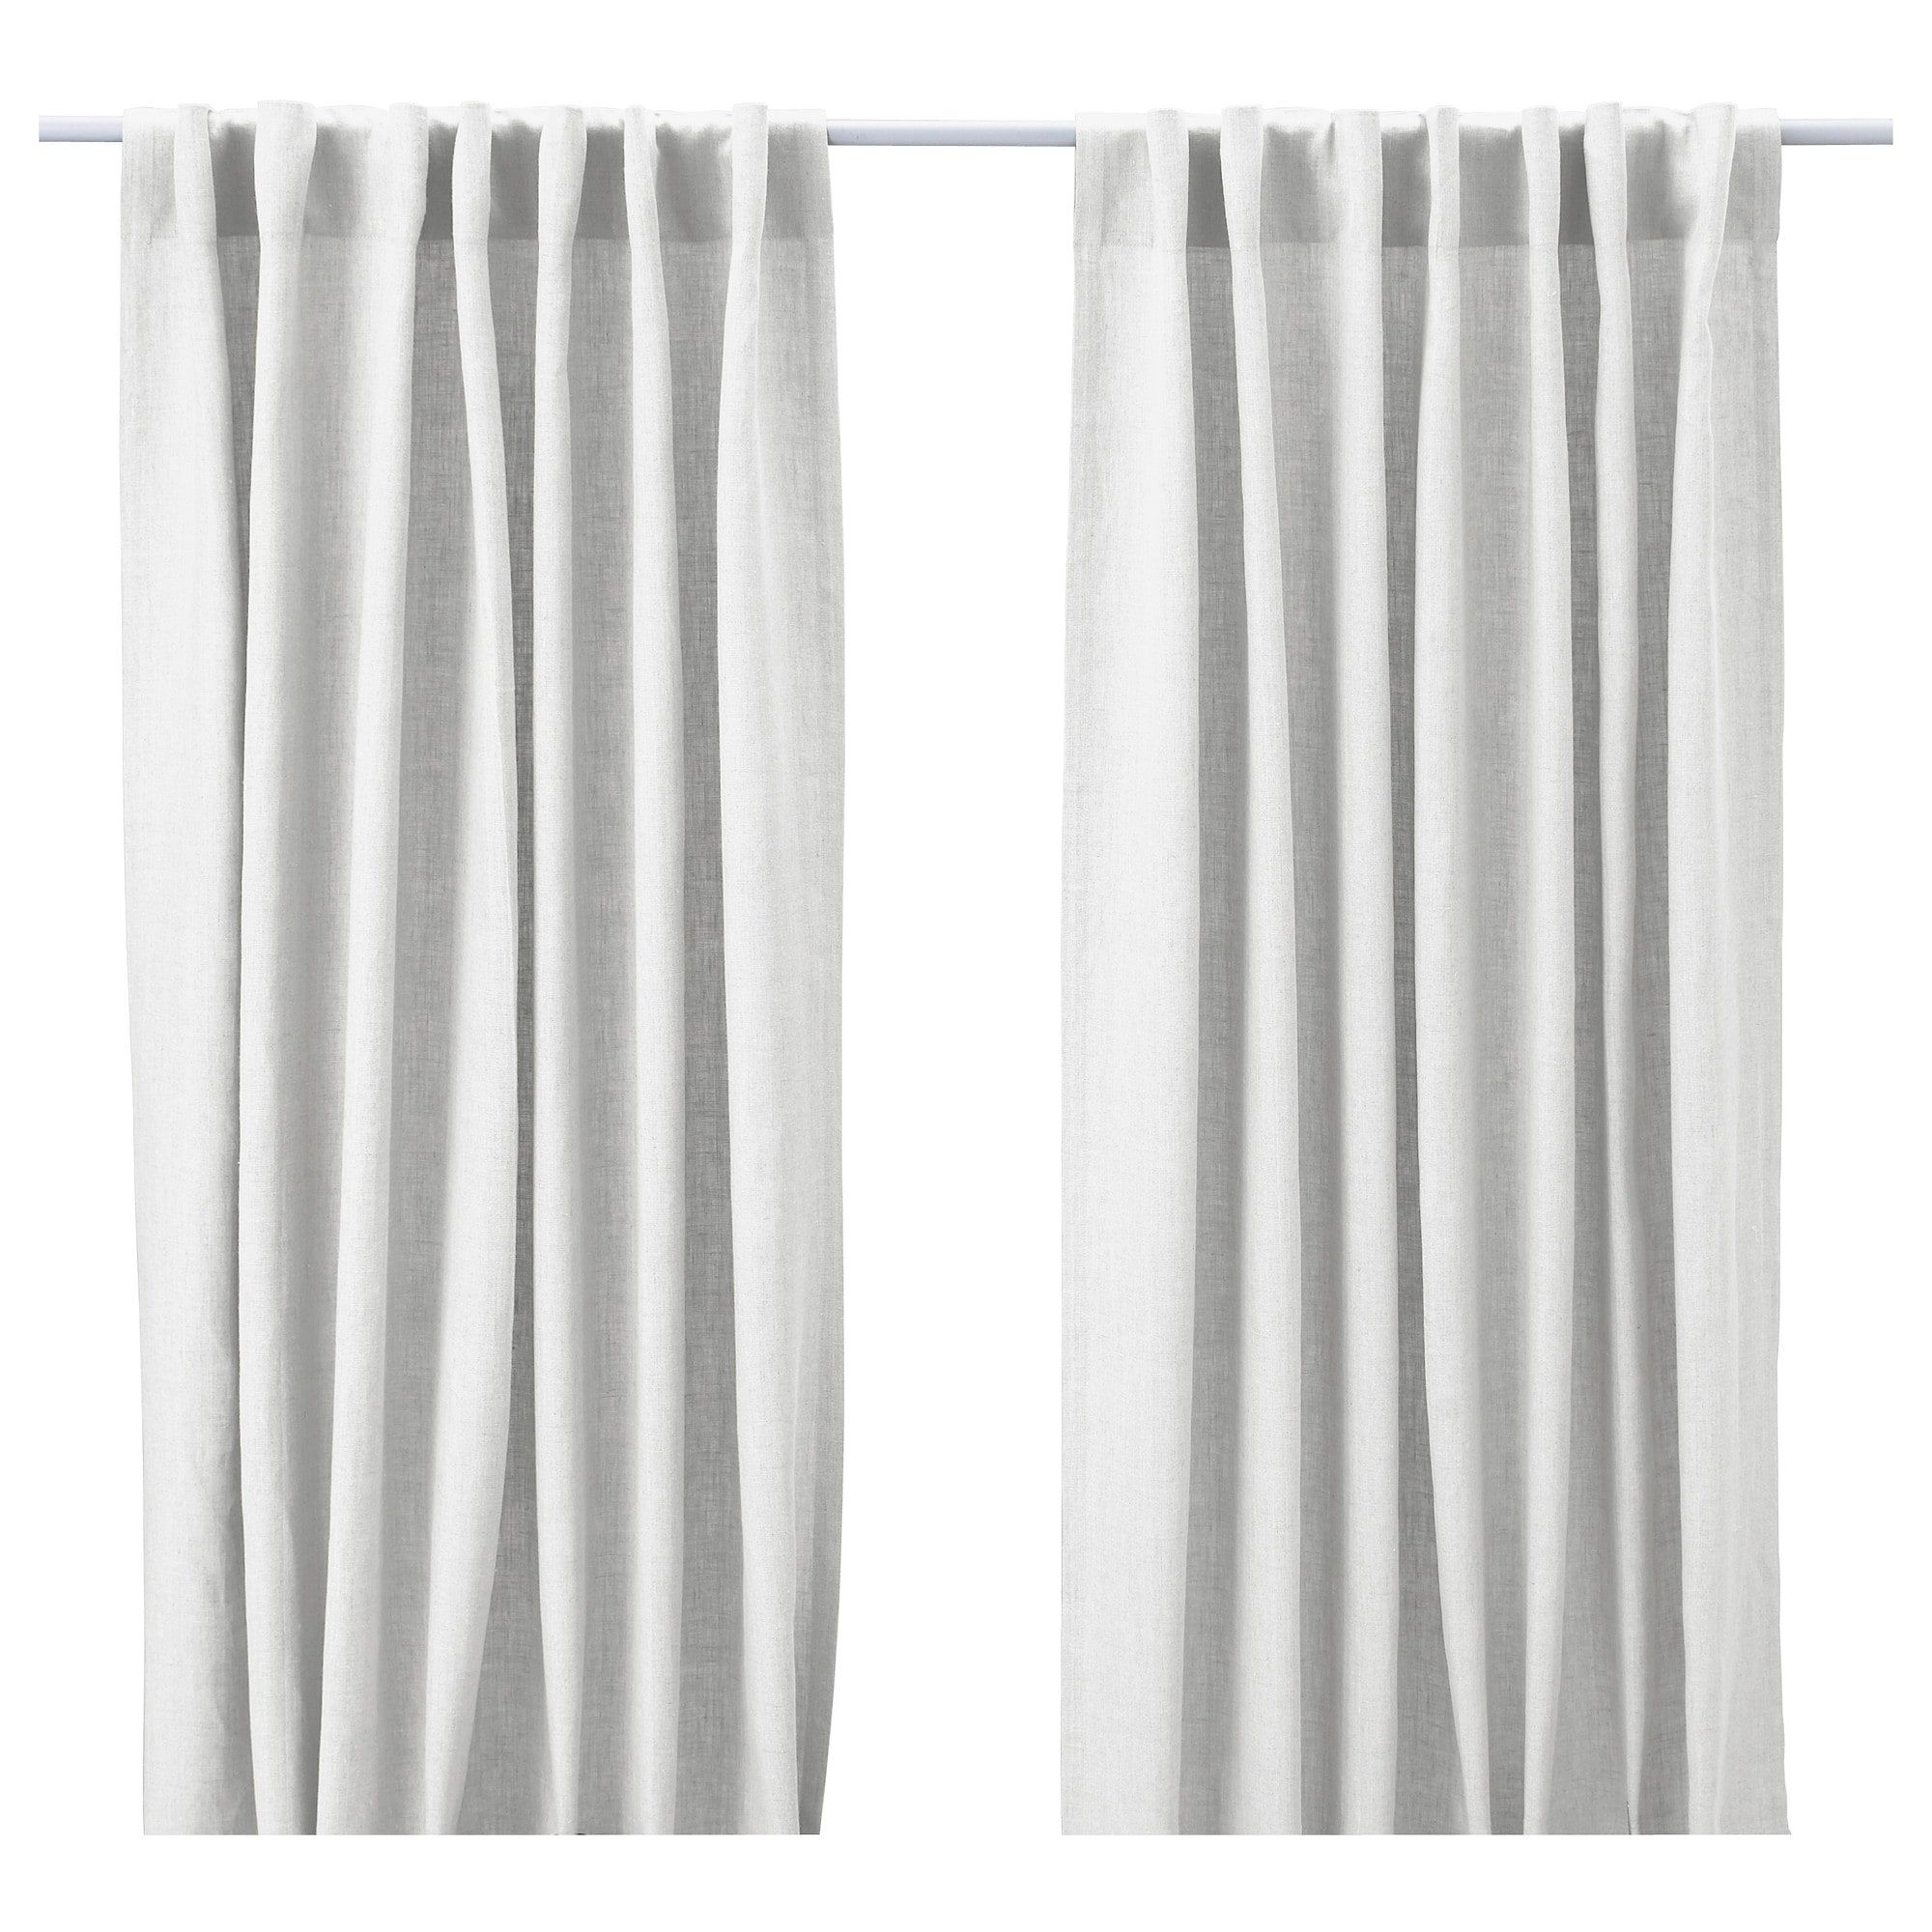 Aina Curtains 1 Pair White 57x98 Ikea Grey Linen Curtains Curtains For Grey Walls Affordable Curtains